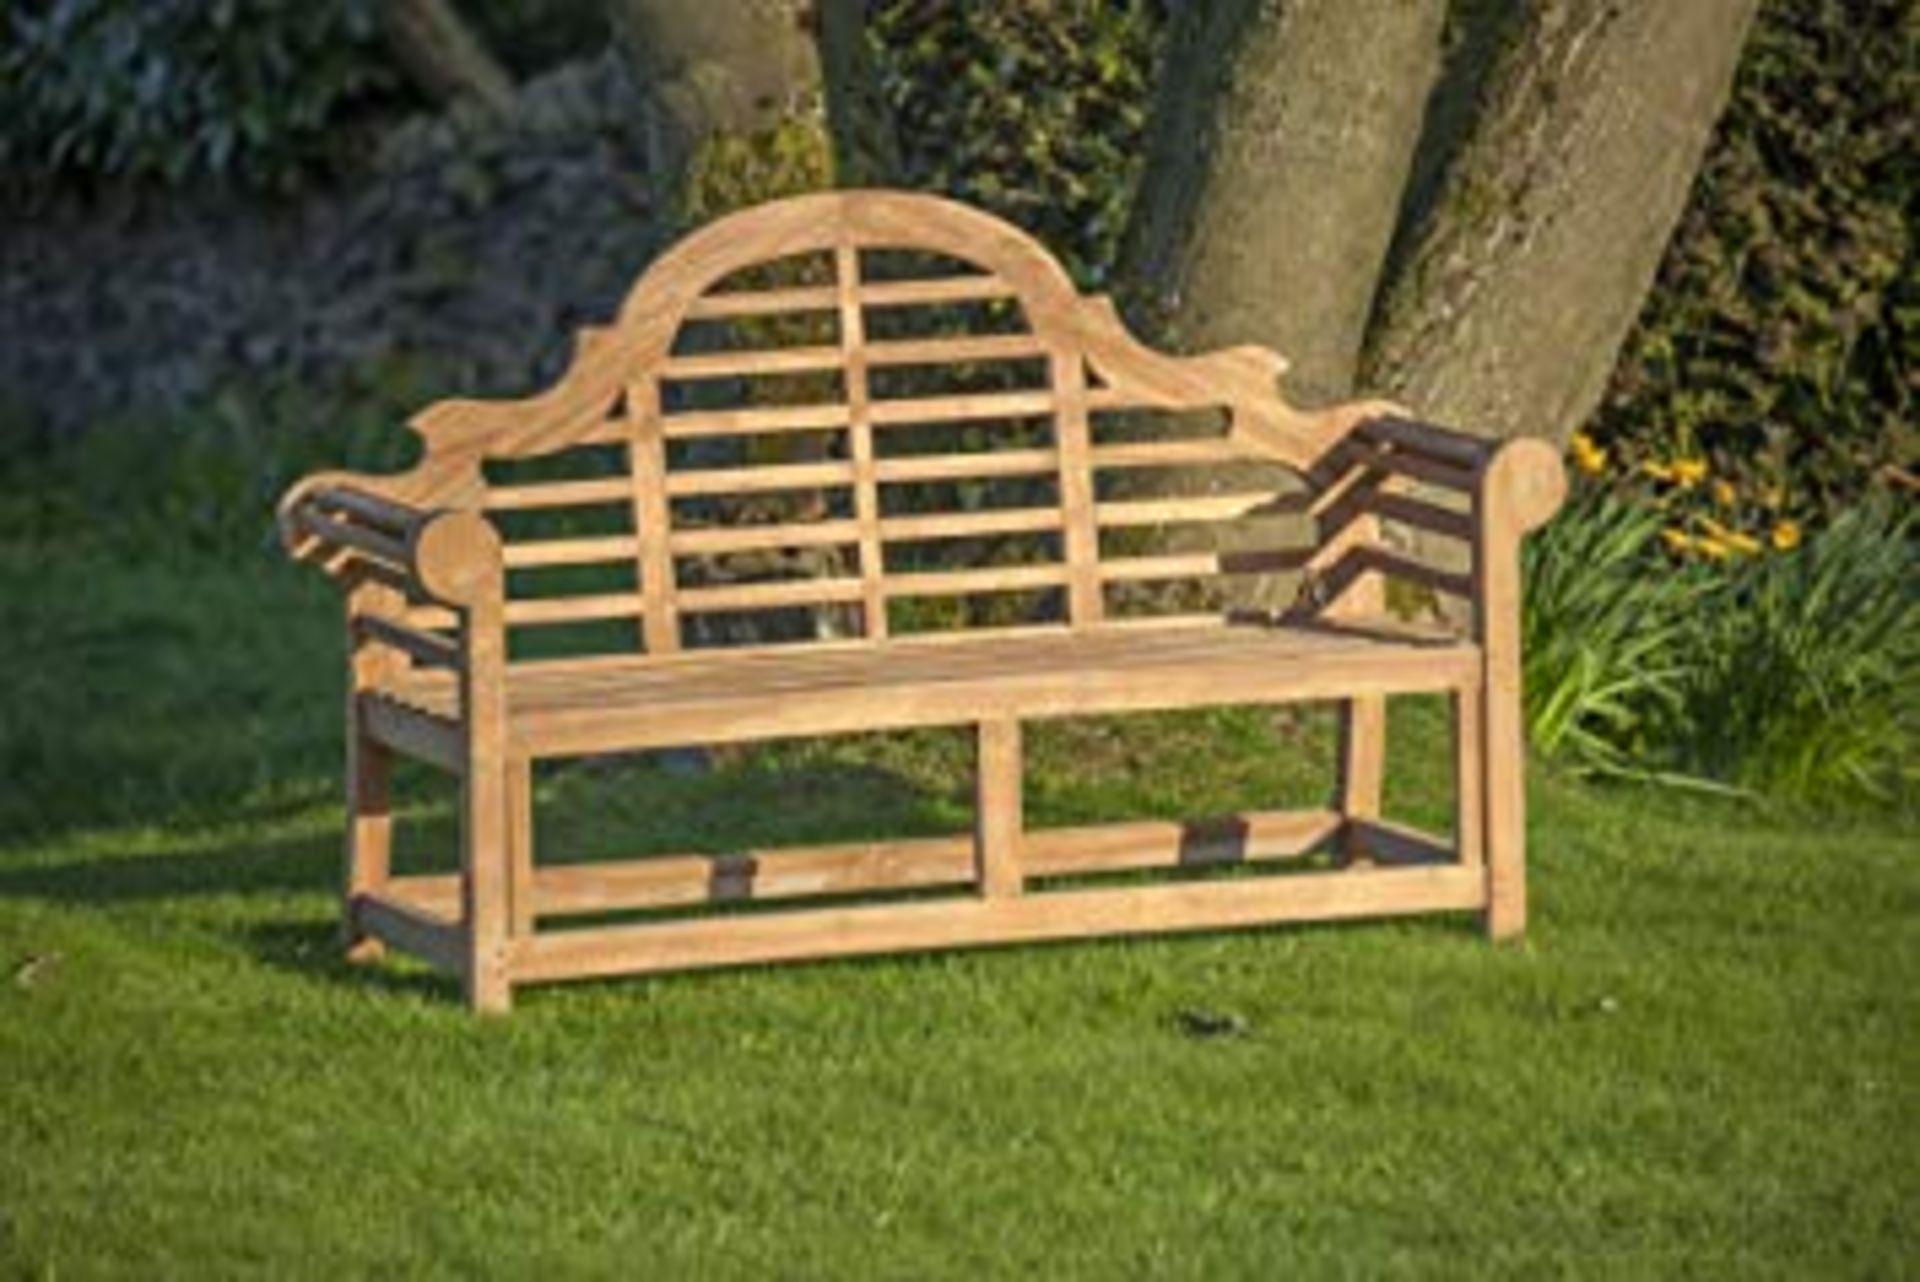 Lot 31884 - V Brand New Teak - Solid Teak Lutyens Style Marlborough Bench Made From Grade A Plantation Teak (ISP